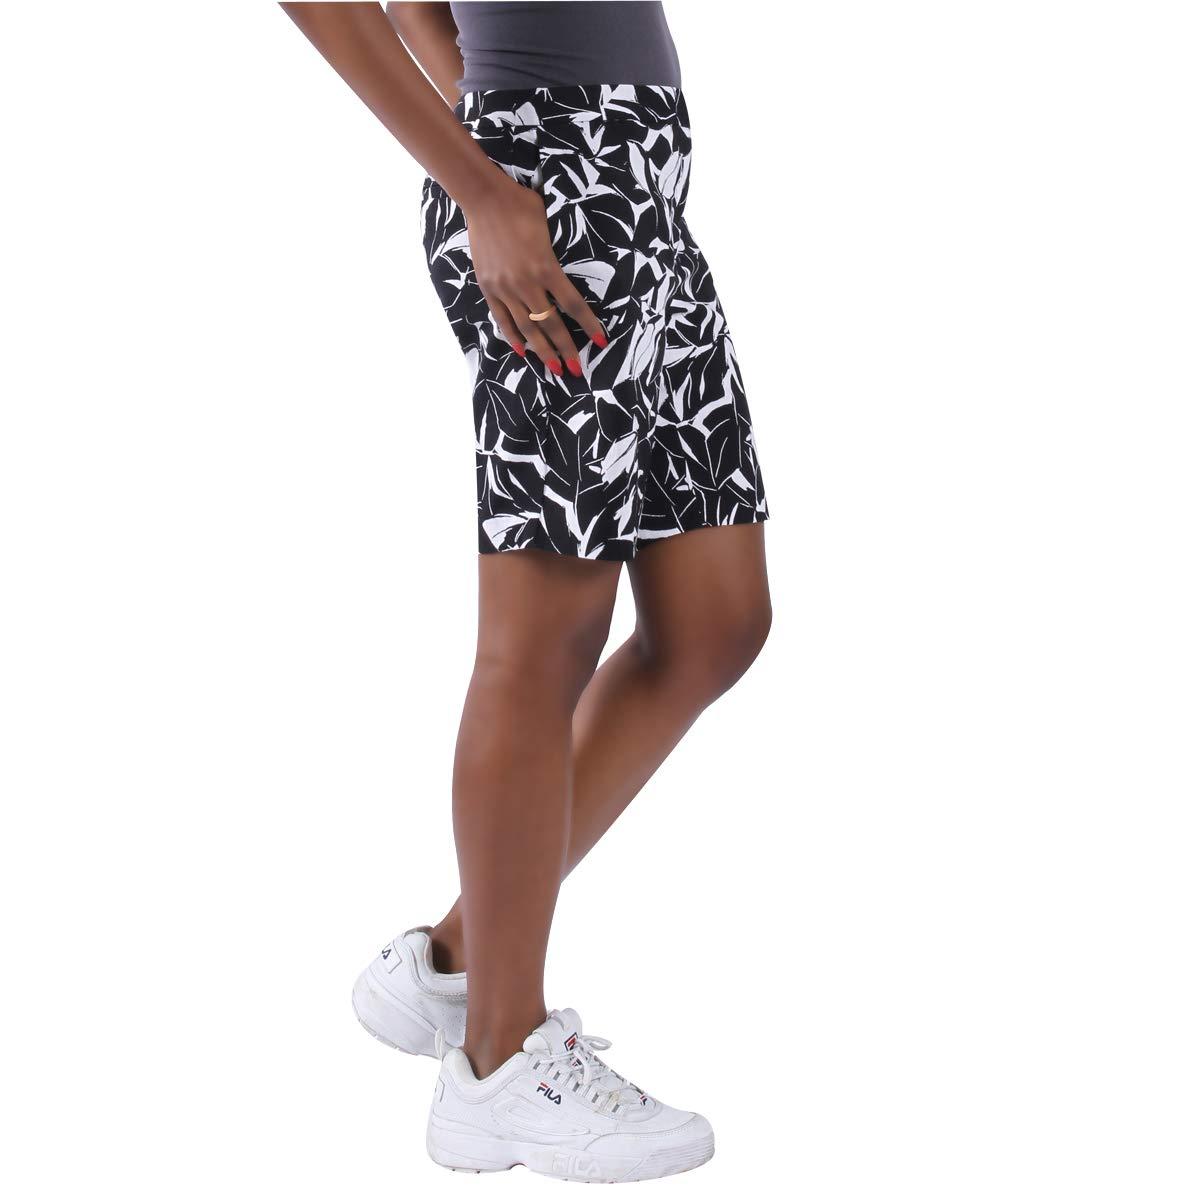 KELLY KLARK Women's Golf Shorts Pockets, Fashion Comfy Walking Shorts Plus Large, Size 16 by KELLY KLARK